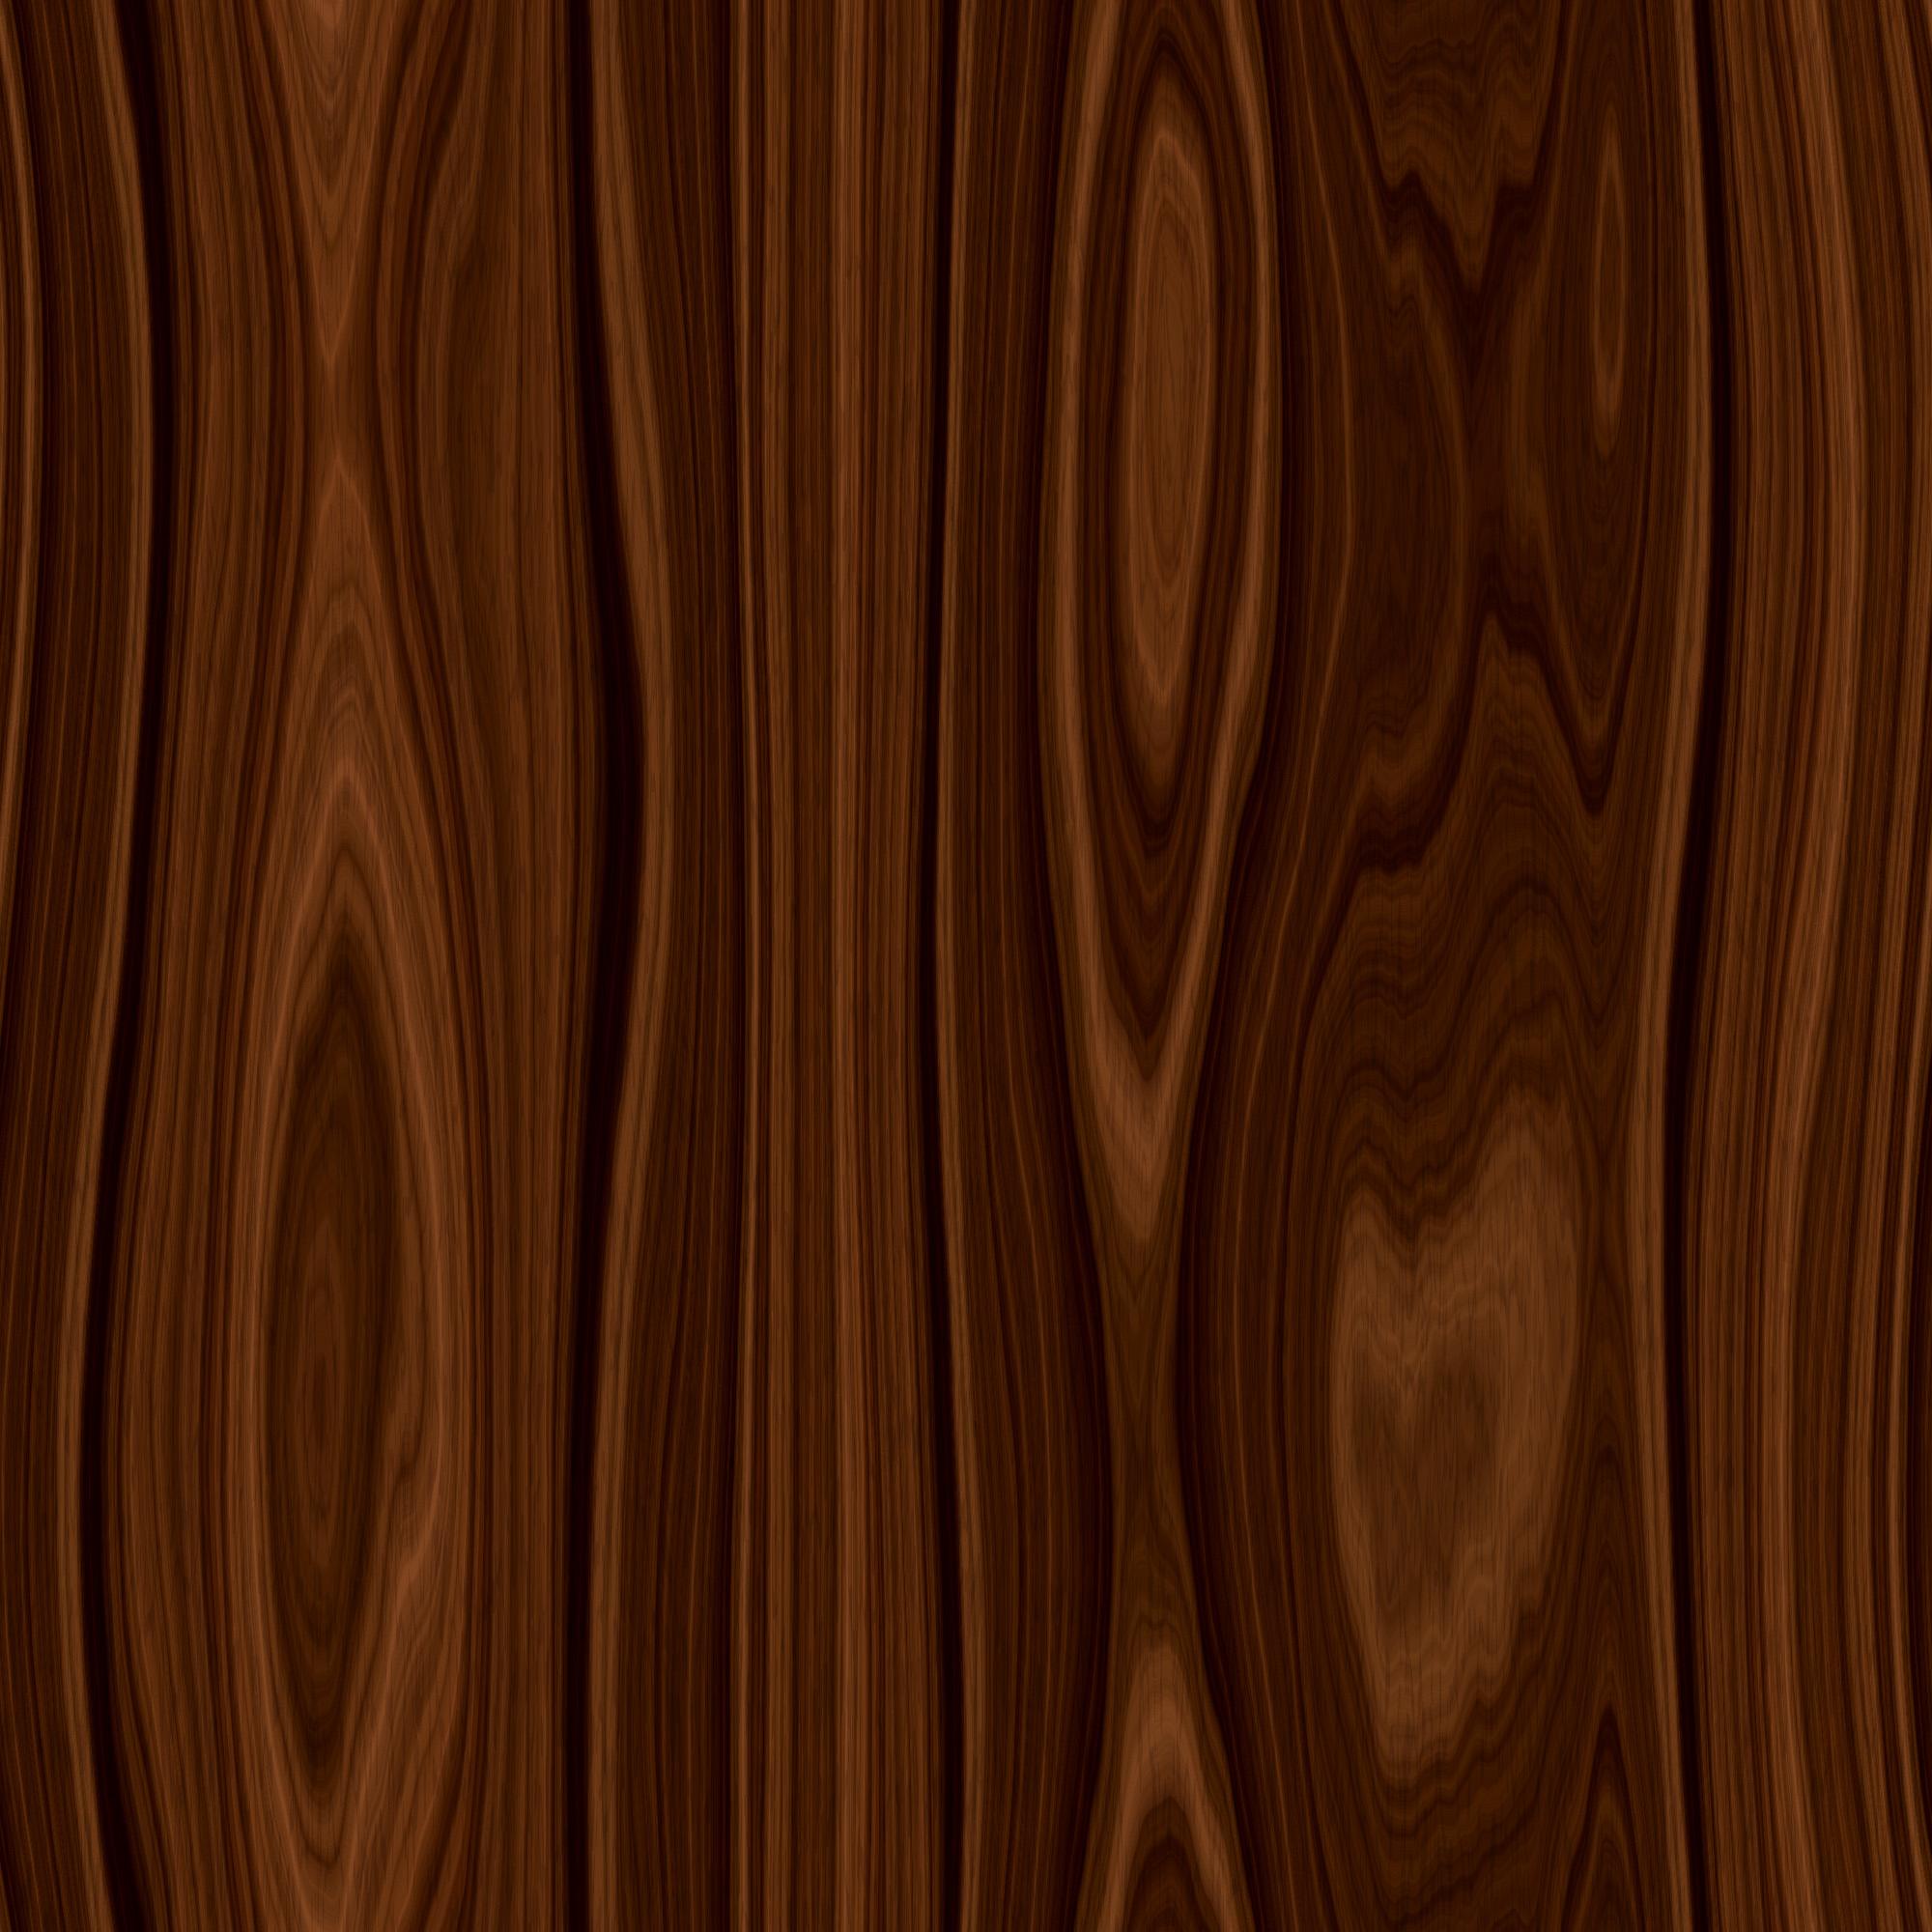 [Resim: textures_v1_746yonv.jpg]